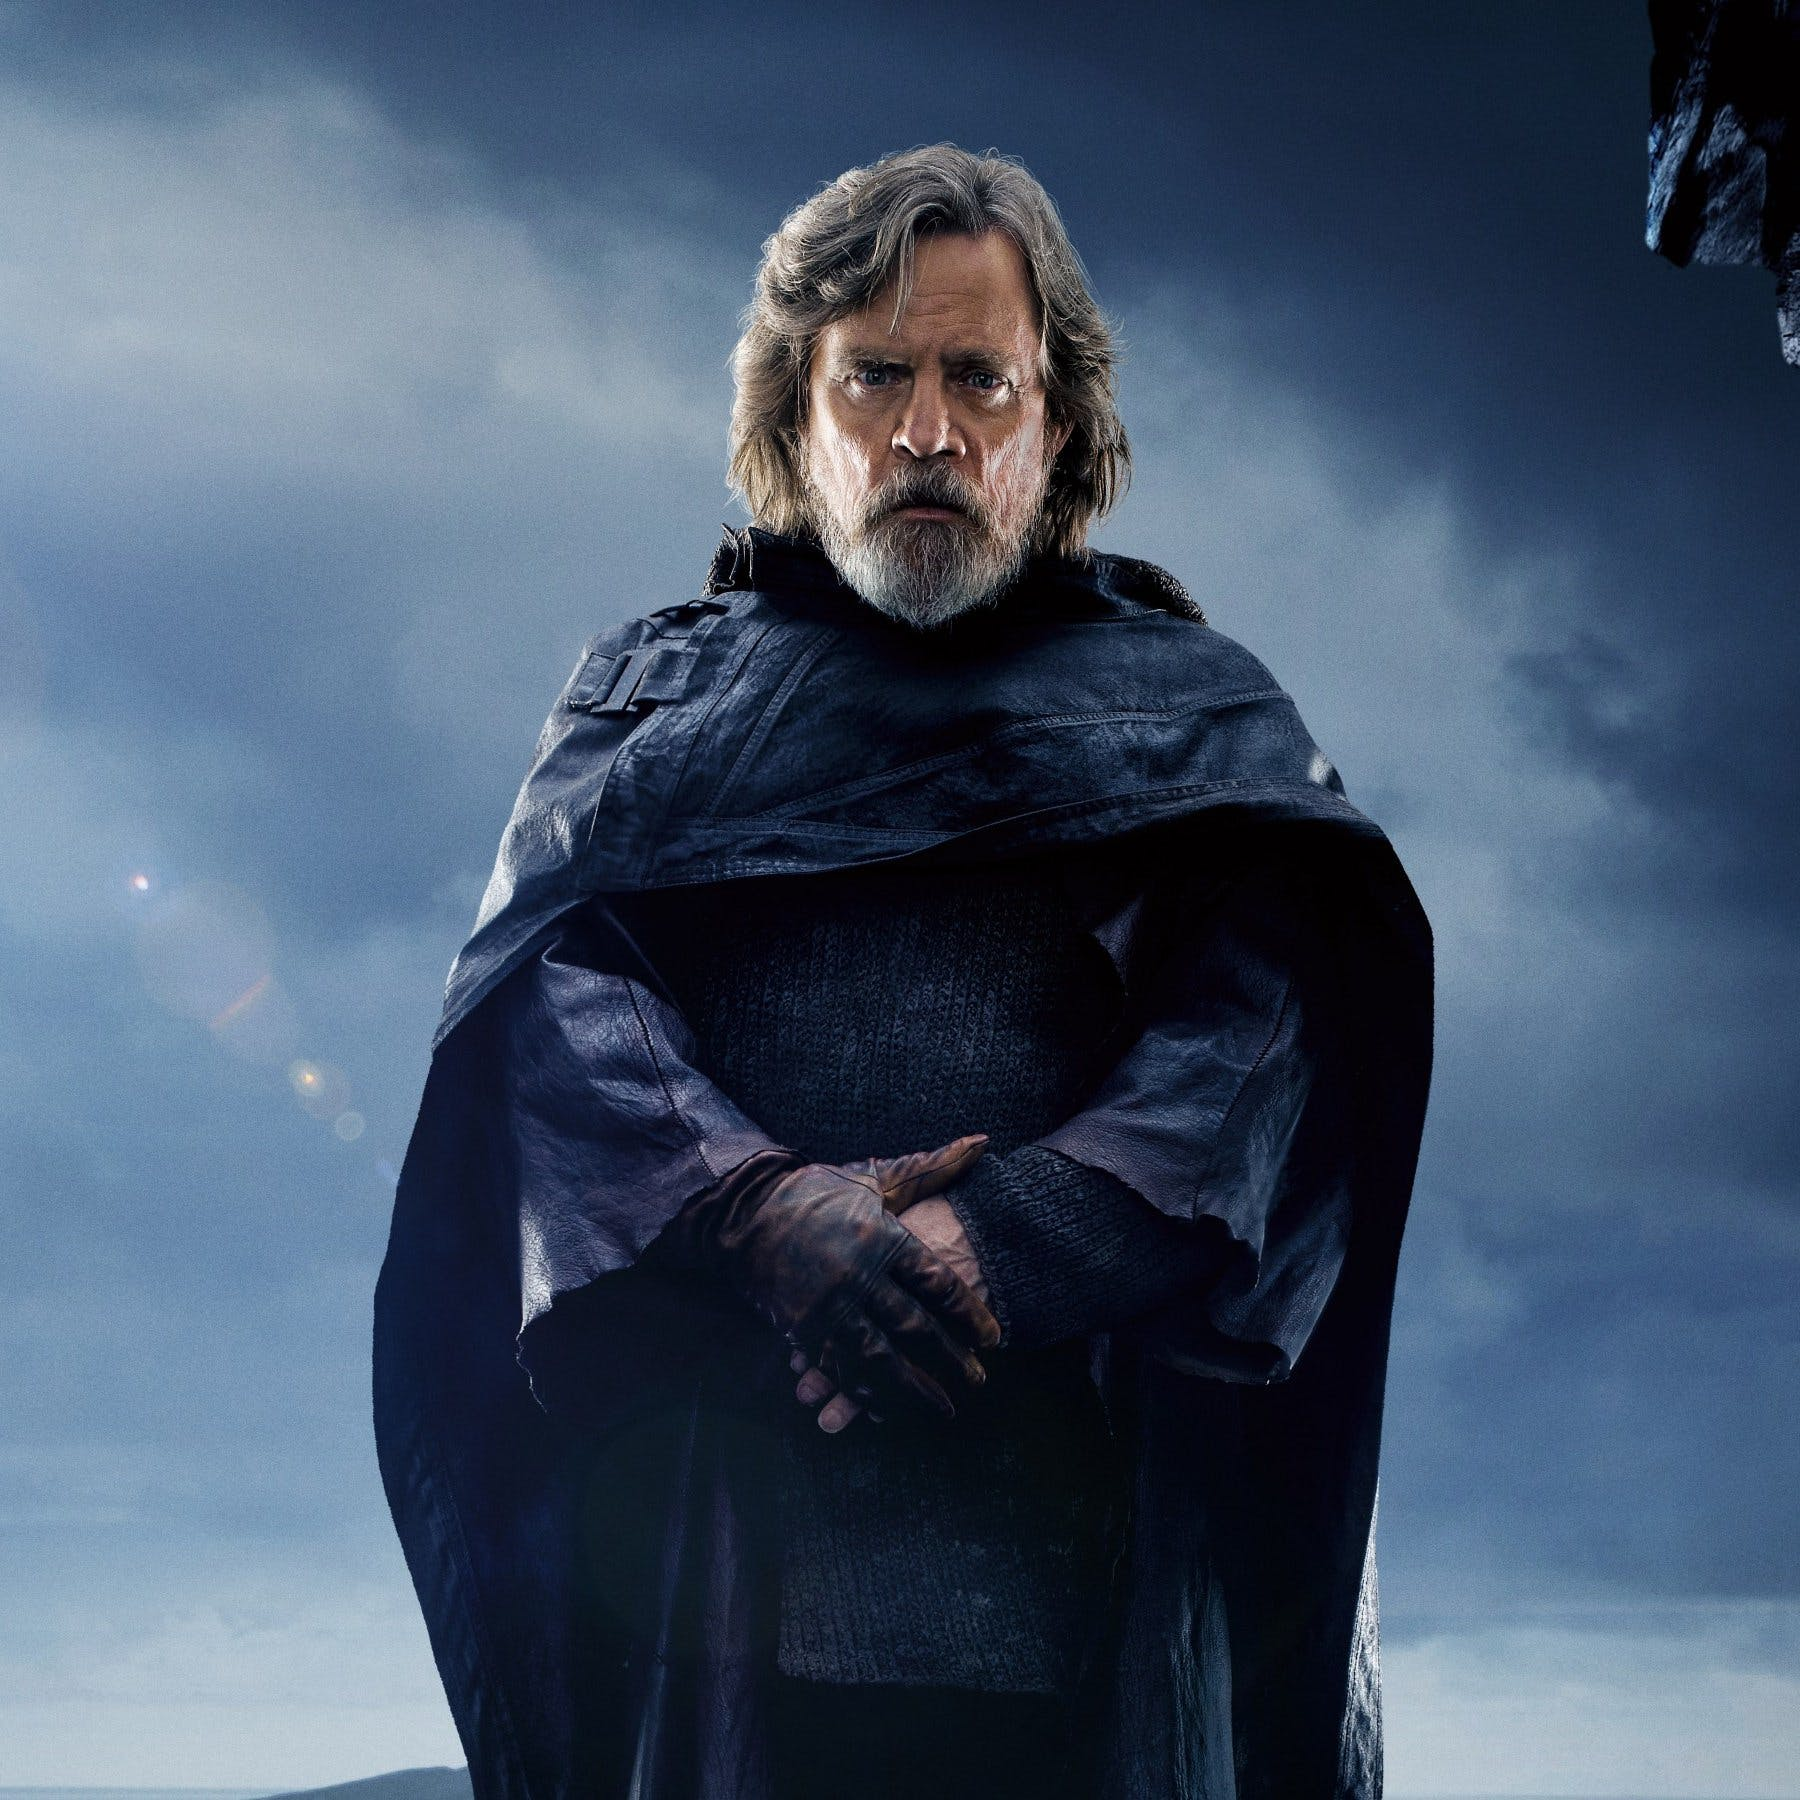 Star wars the last jedi 2880x1800 mark hamill luke skywalker 4k 11602 kaozc1go5d